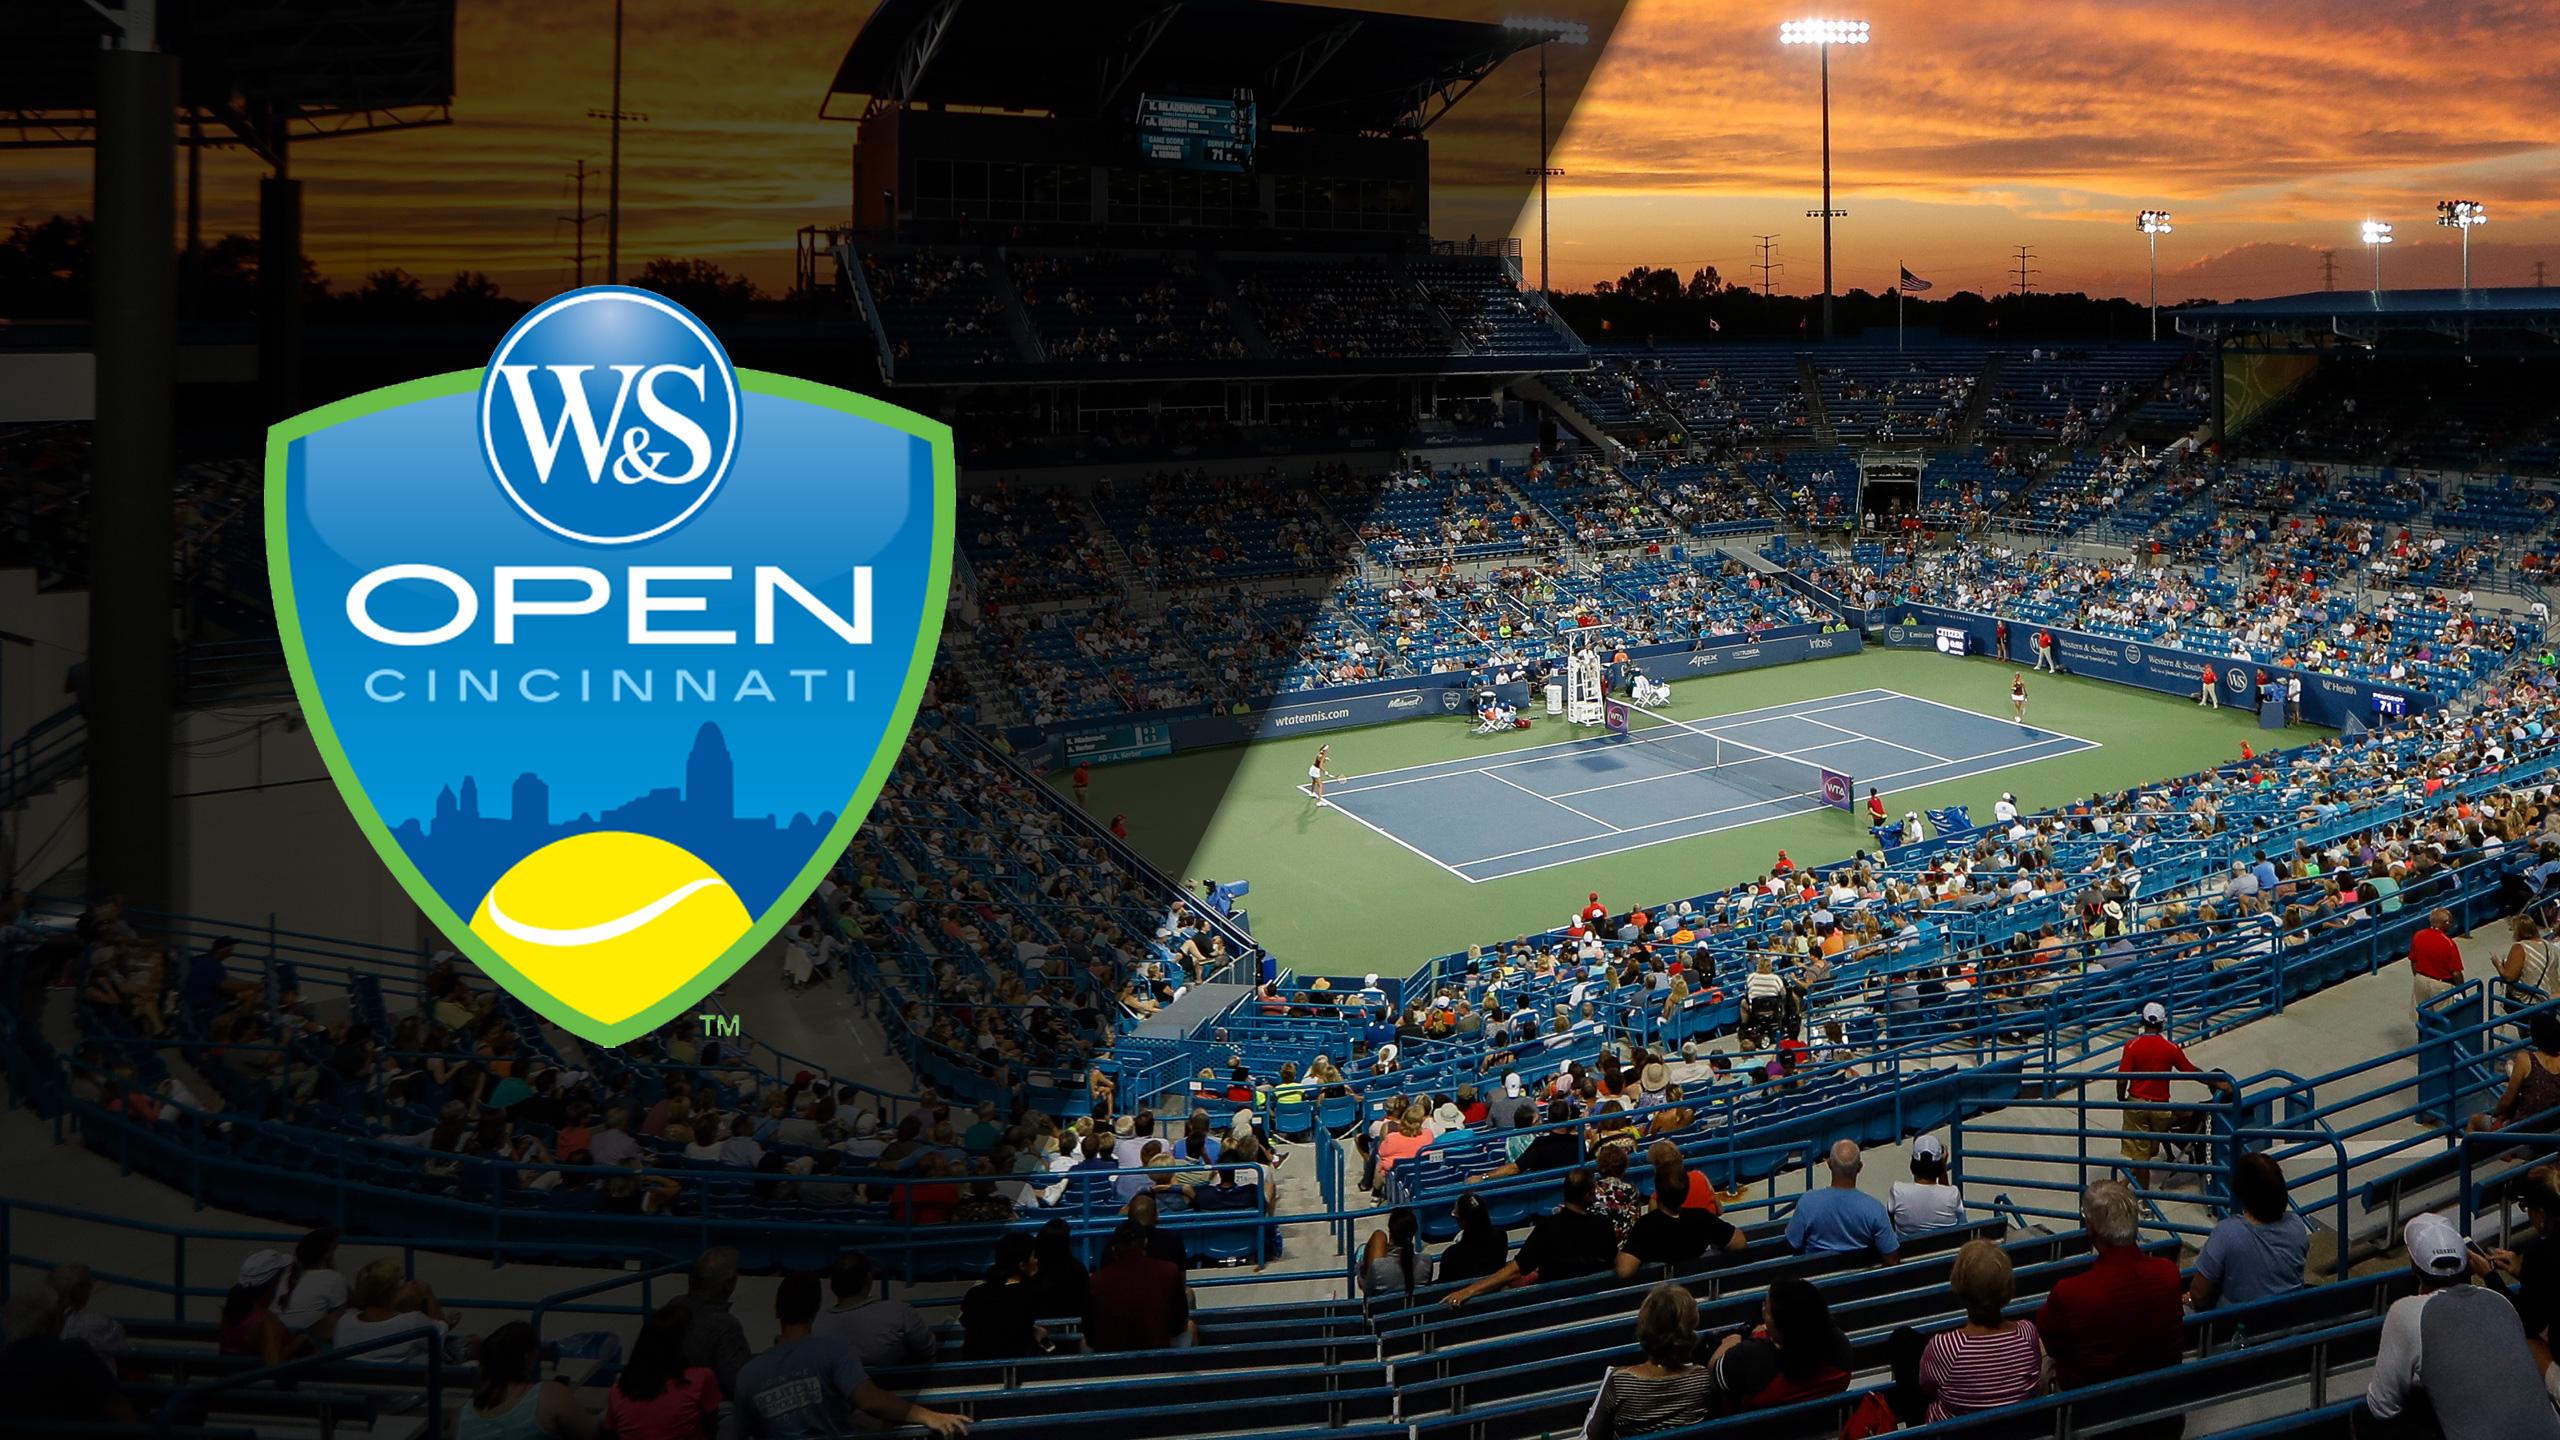 2018 US Open Series - Western & Southern Open (Men's Semifinal #2)